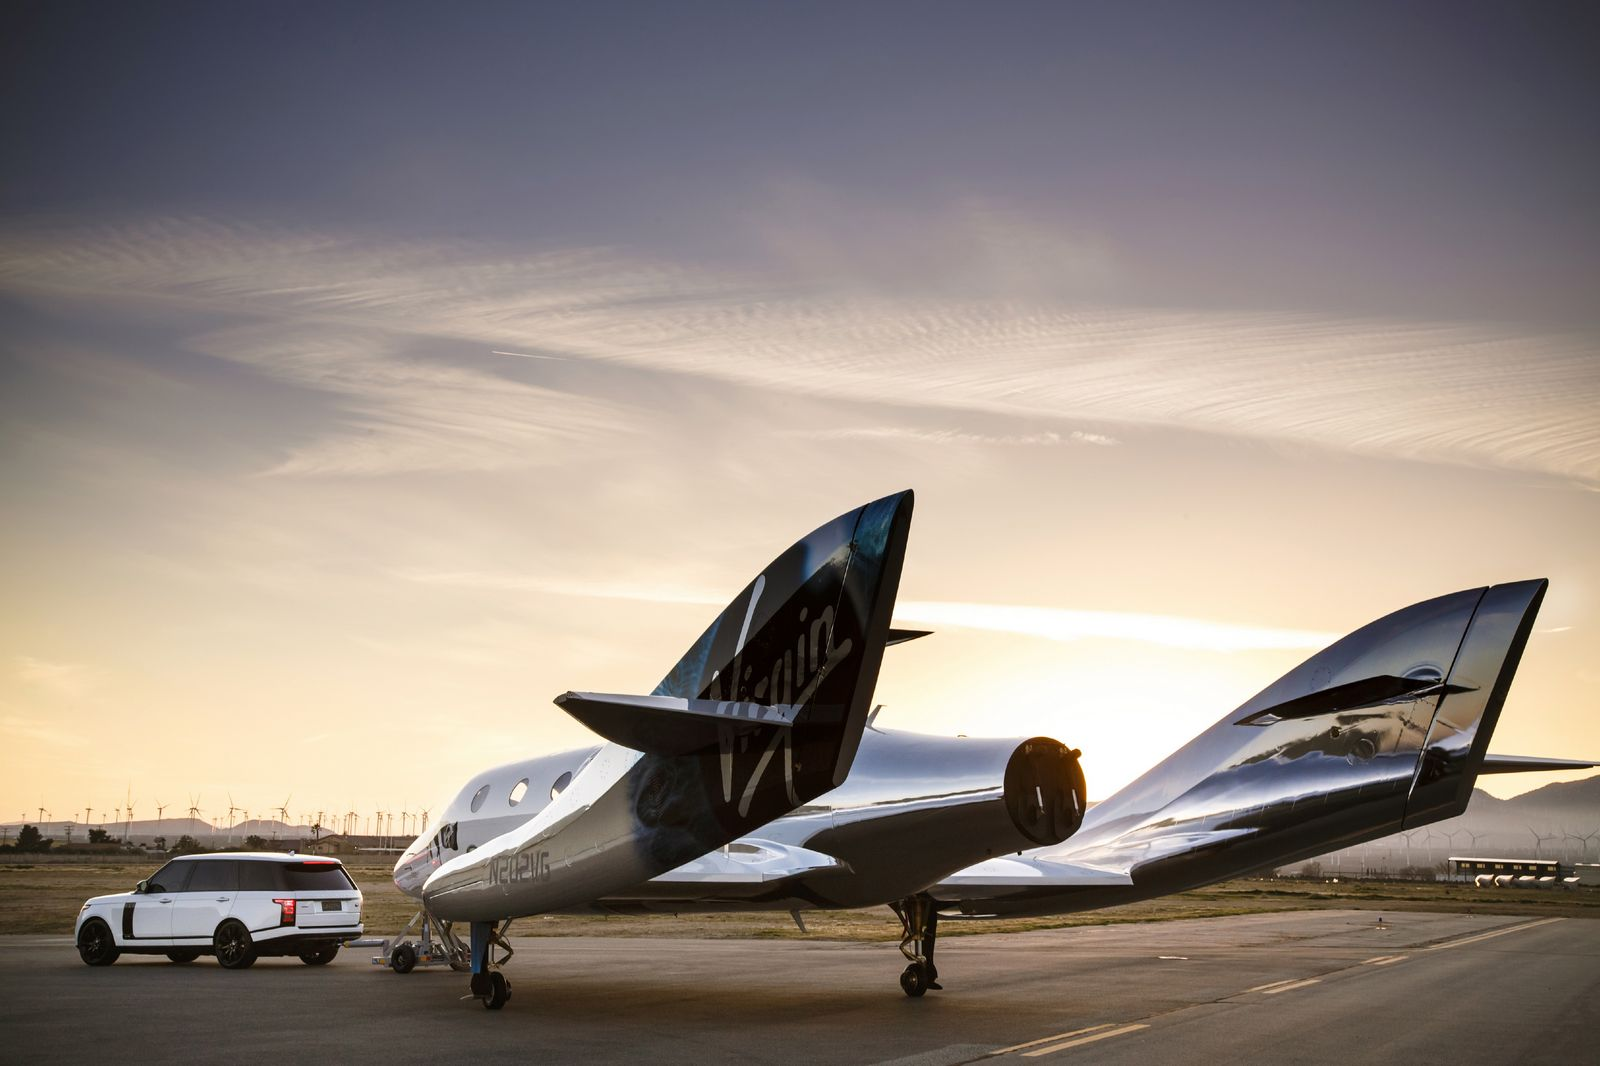 Range-Rover-Autobiography-Virgin-Galactic-5.jpg